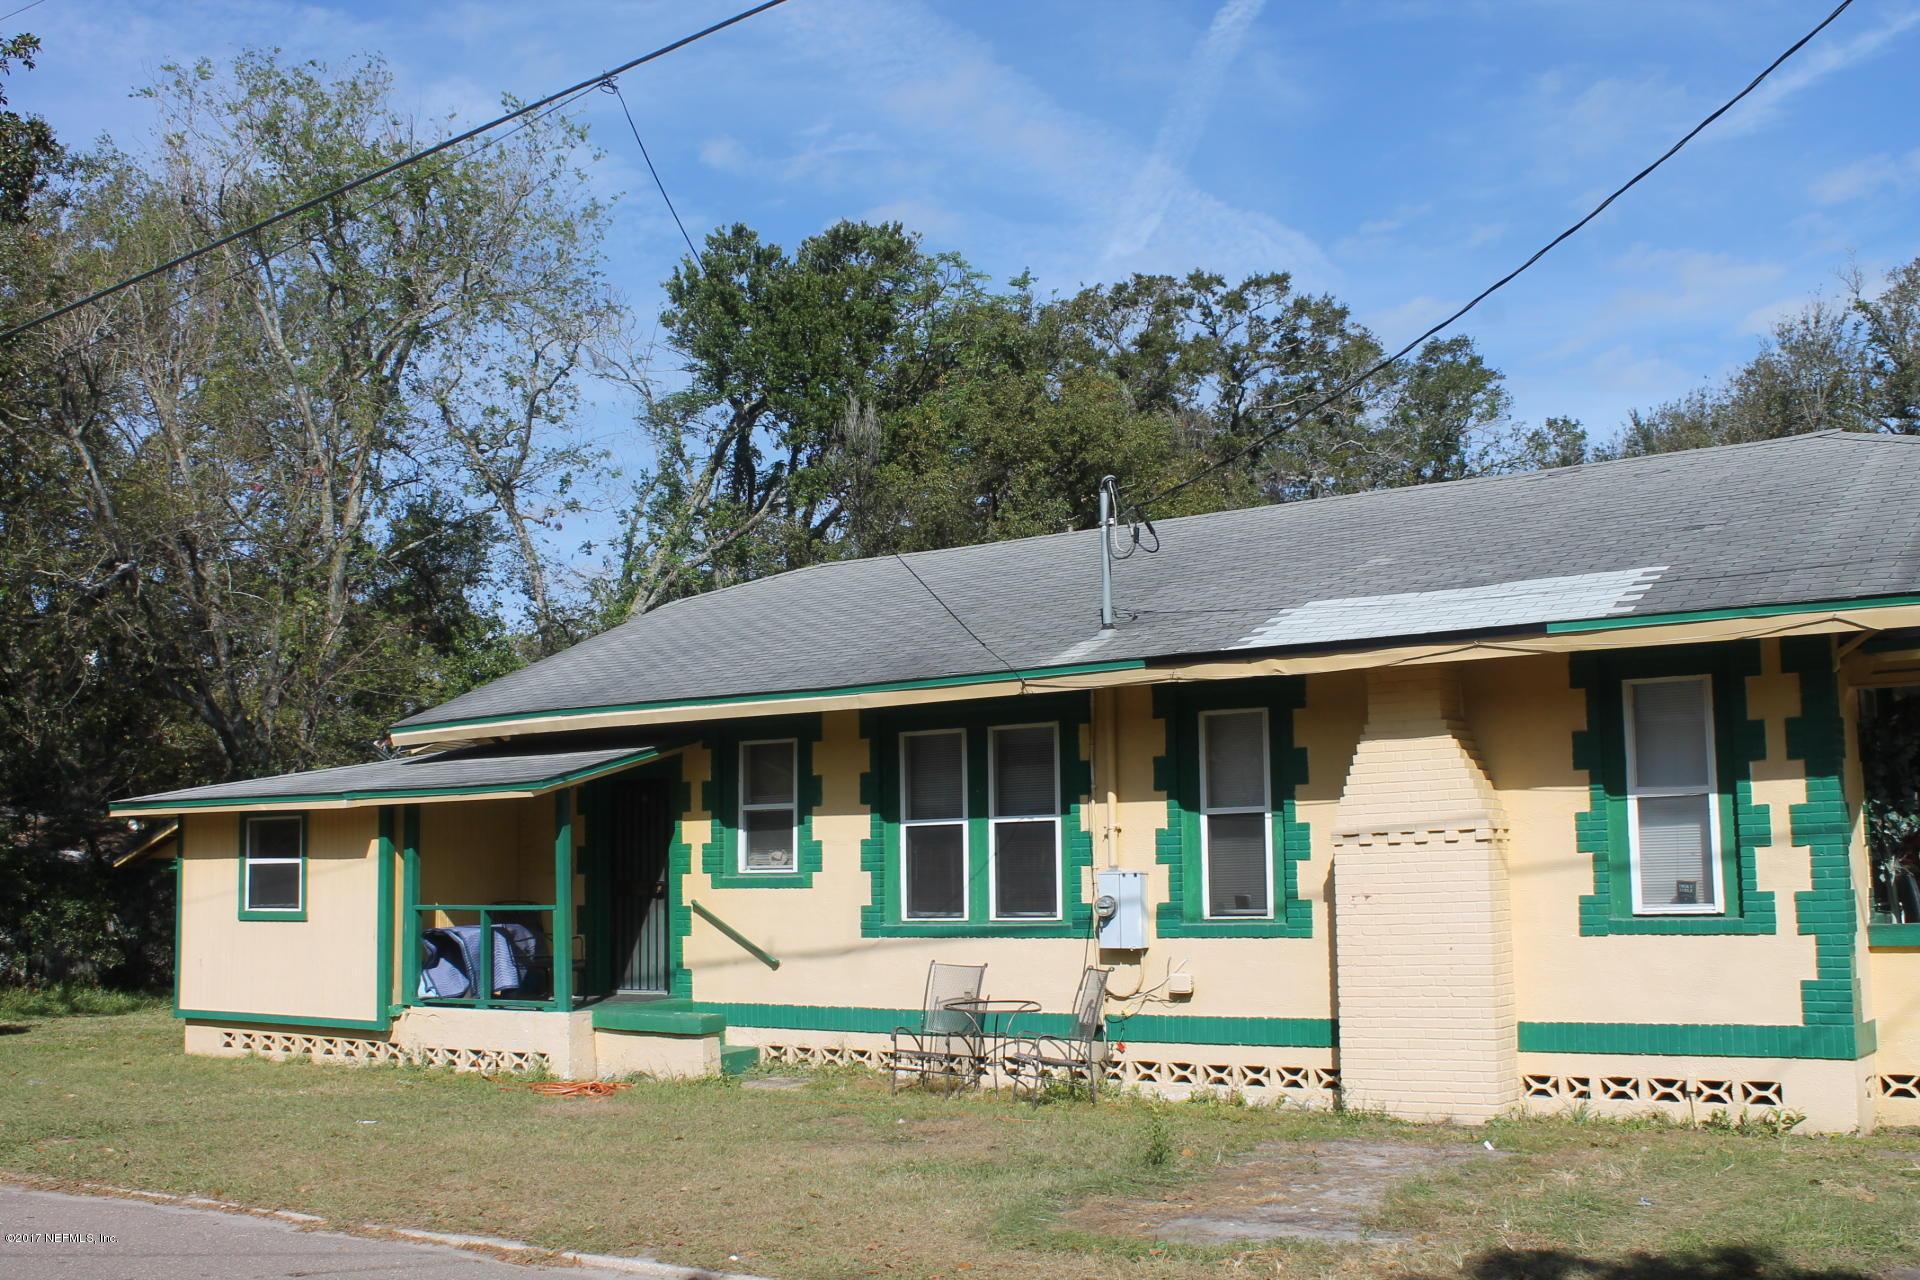 3904 NOTTER, JACKSONVILLE, FLORIDA 32206, 3 Bedrooms Bedrooms, ,2 BathroomsBathrooms,Commercial,For sale,NOTTER,910222